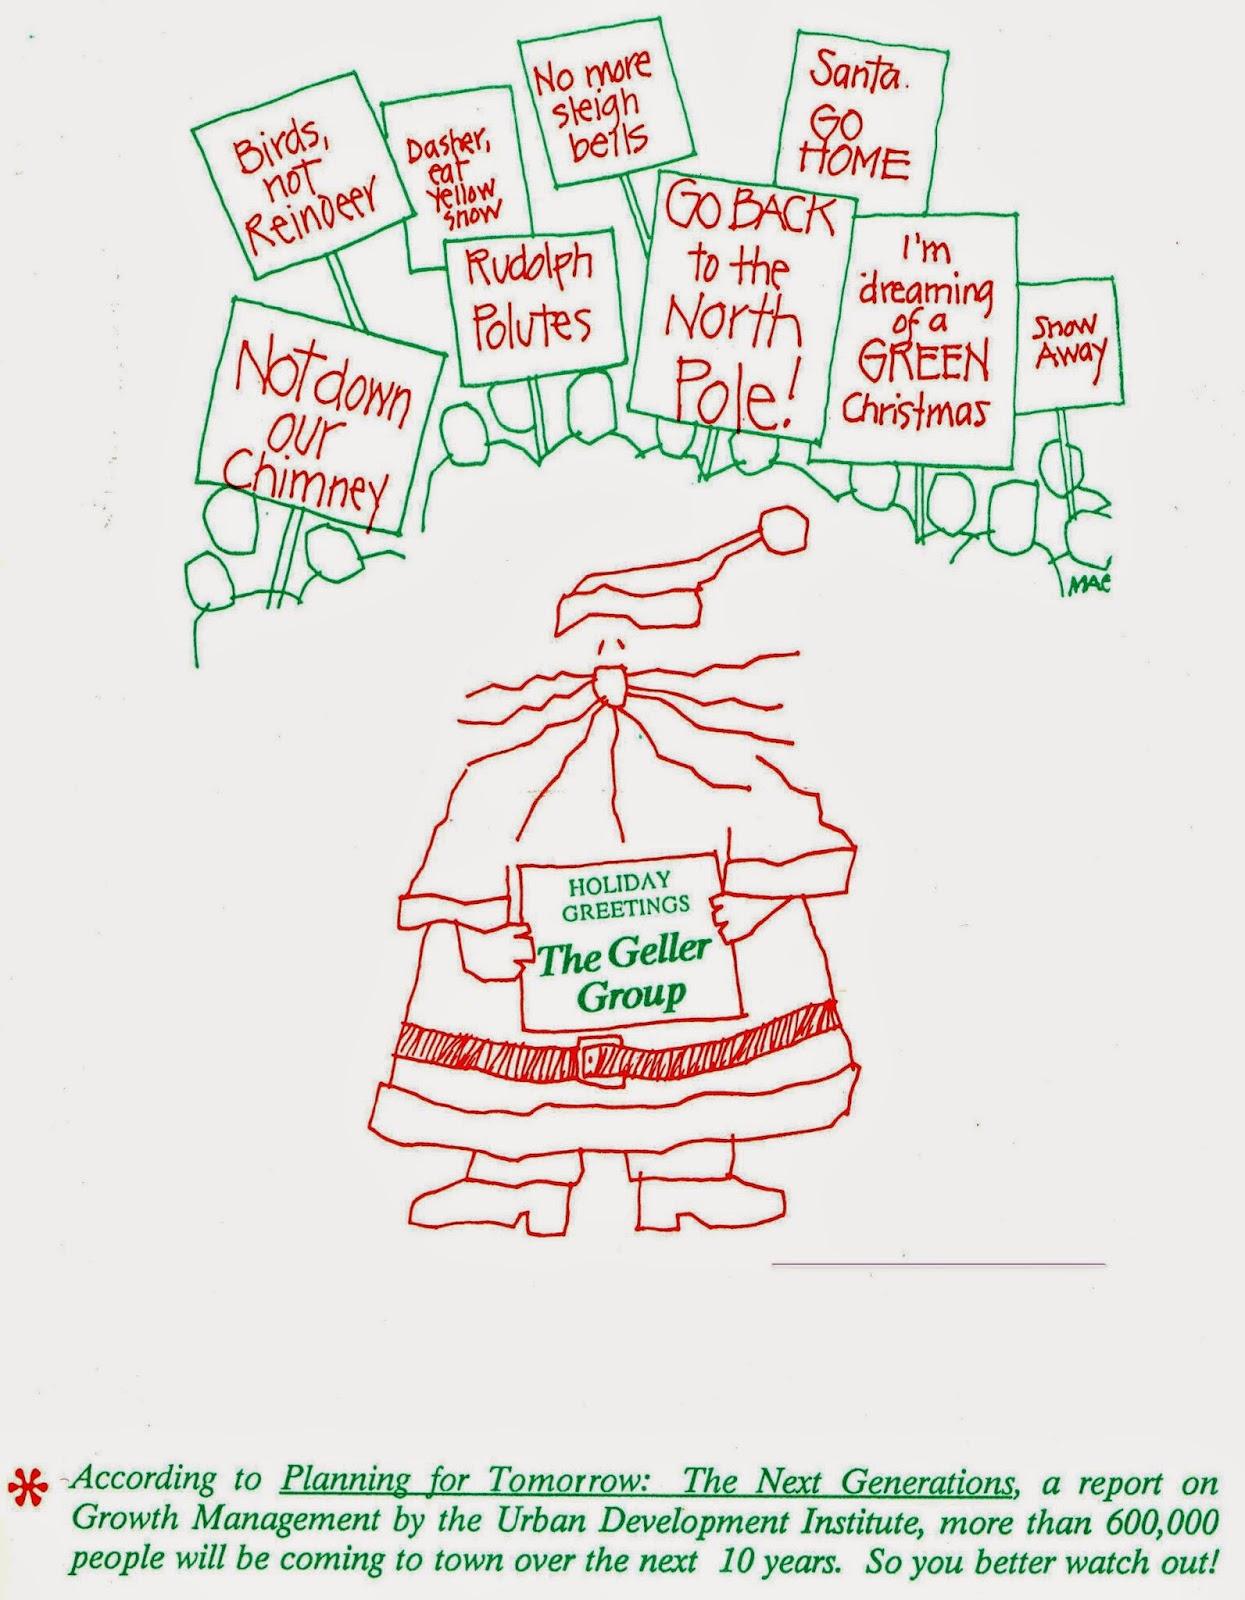 Michael Gellers Blog Geller Christmas Cards Over The Years